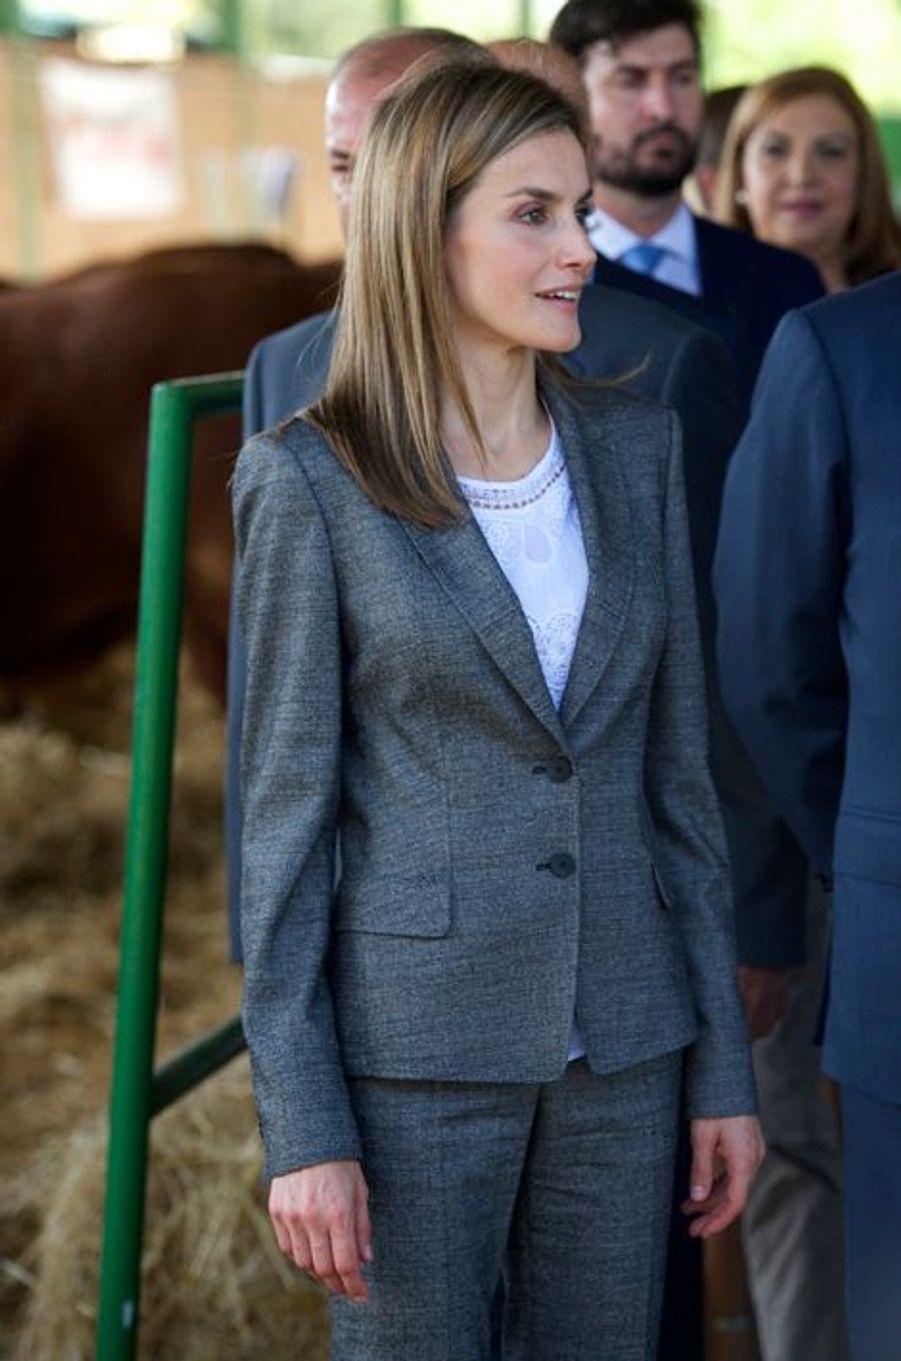 La reine Letizia et le roi Felipe VI d'Espagne inaugurent la Feria internacionale Ganadera à Zafra, le 2 octobre 2014